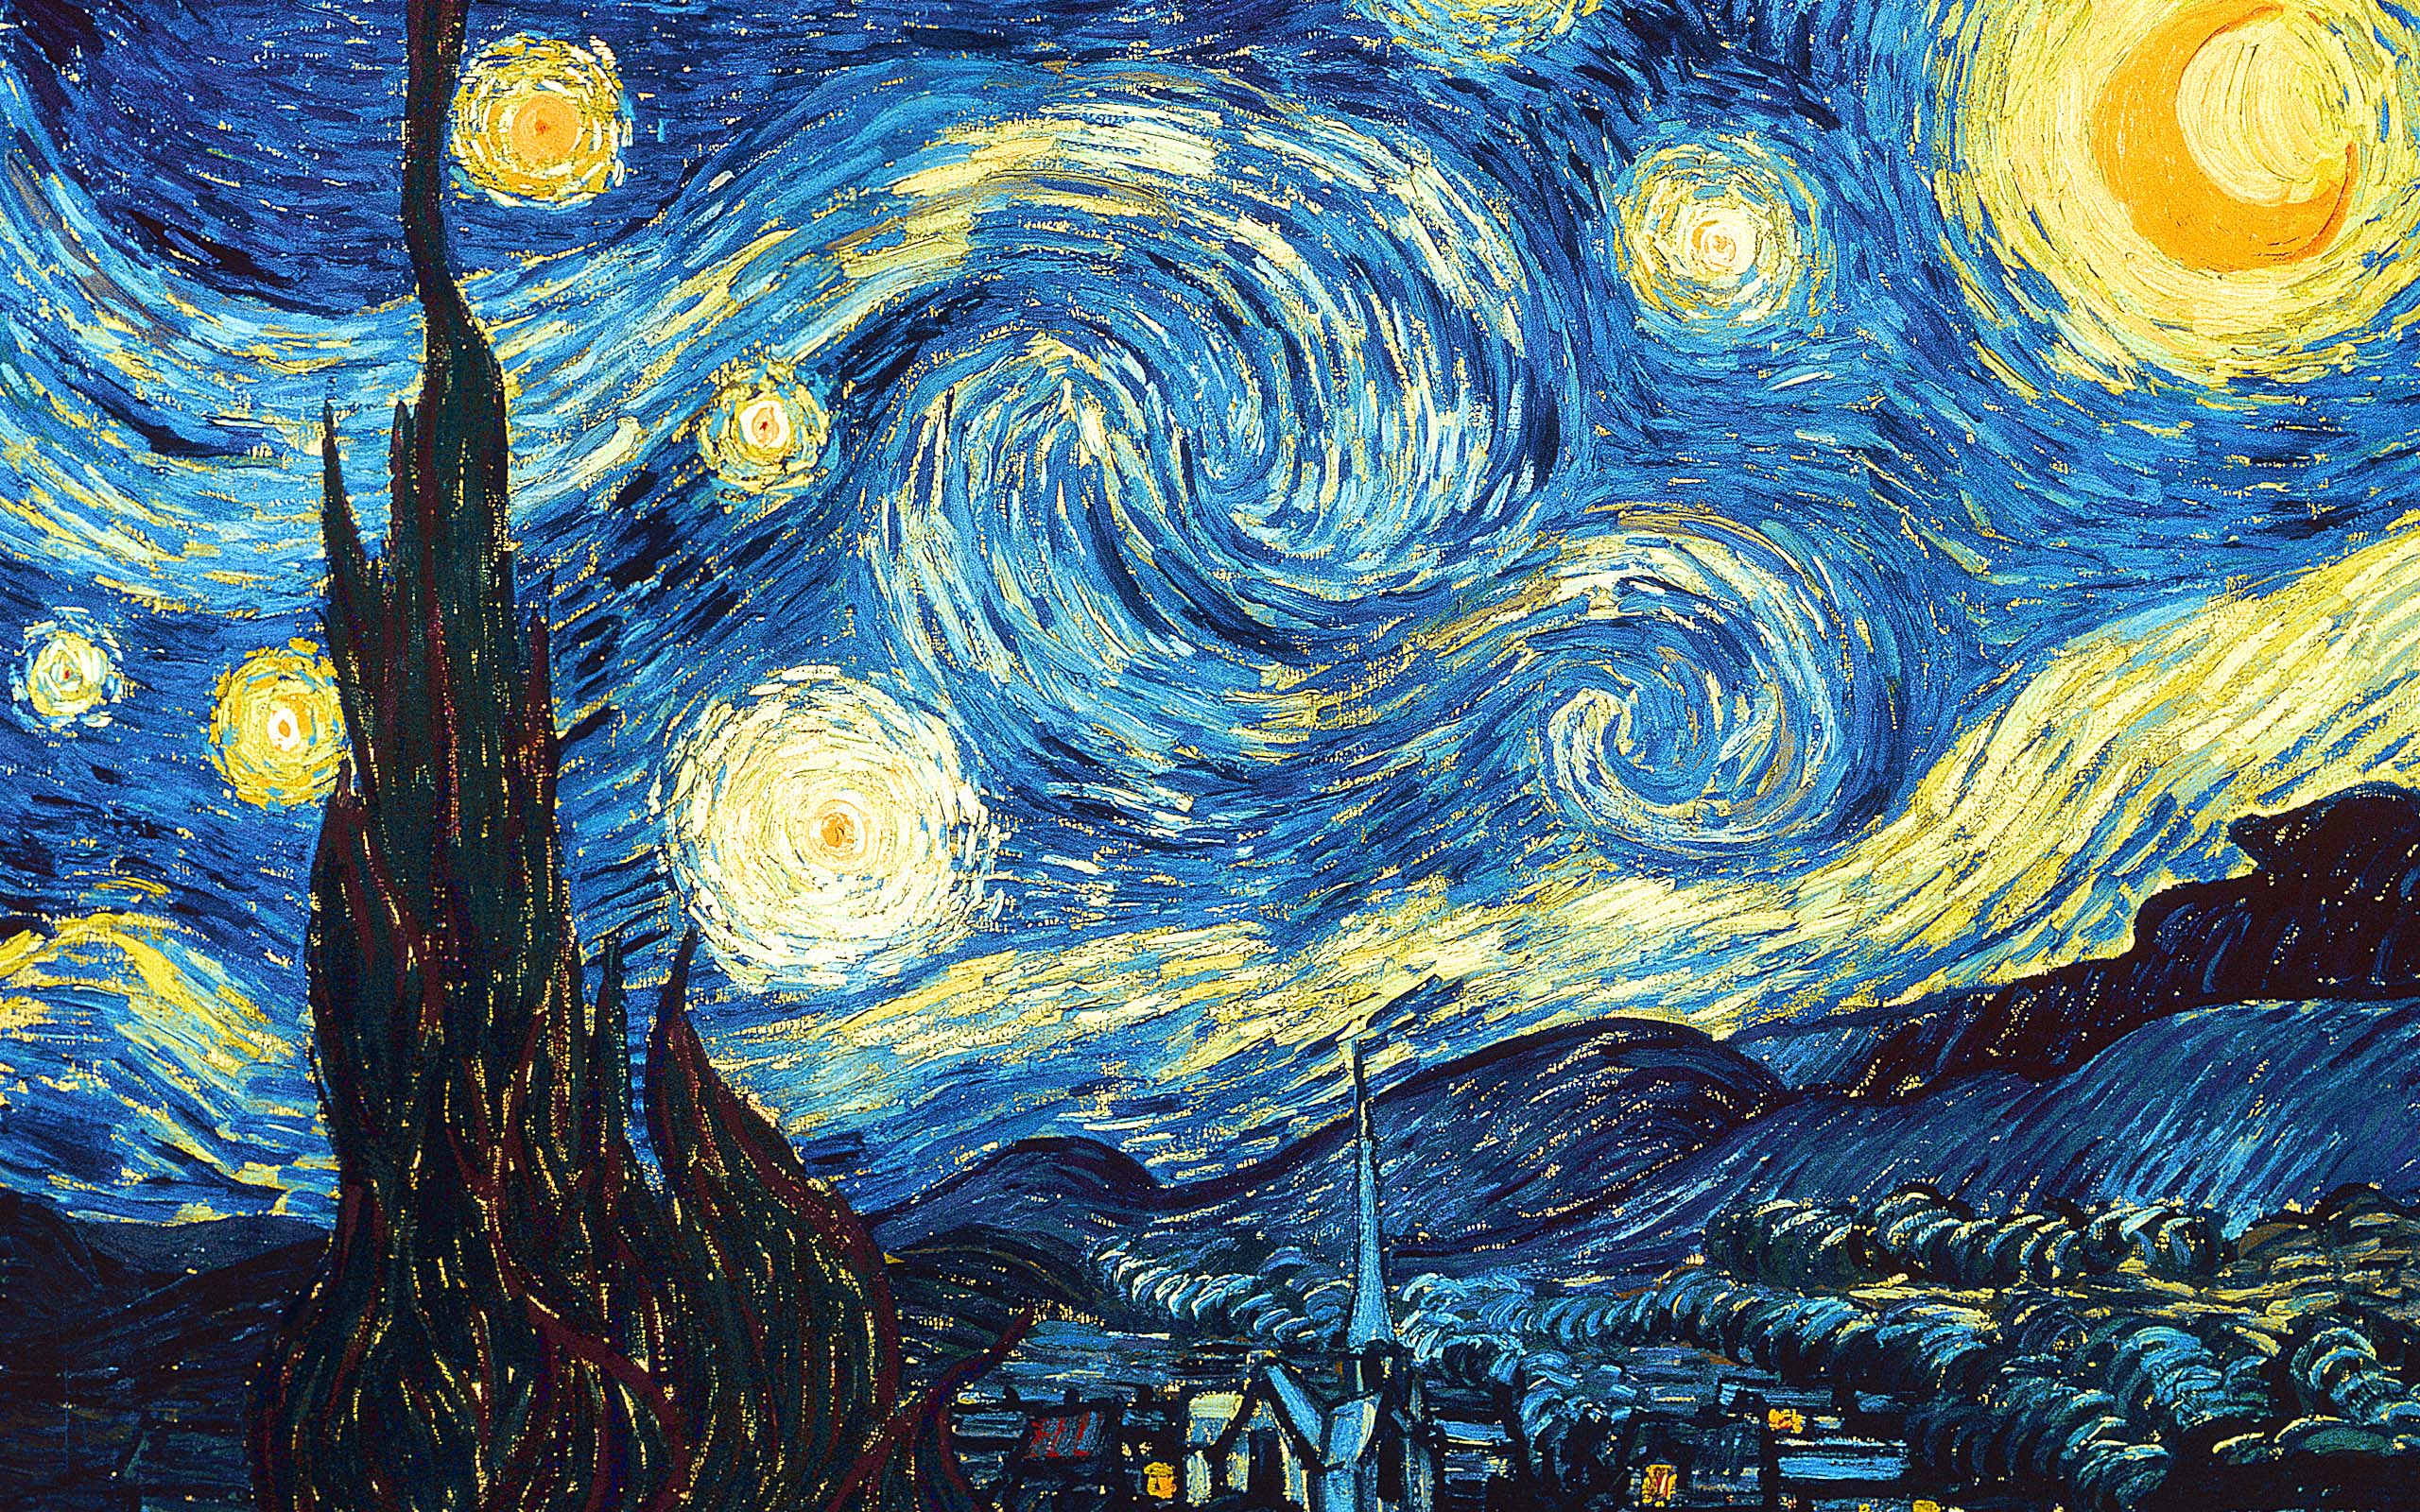 Van Gogh Starry Night High Resolution Van Gogh The Starry Night 1889